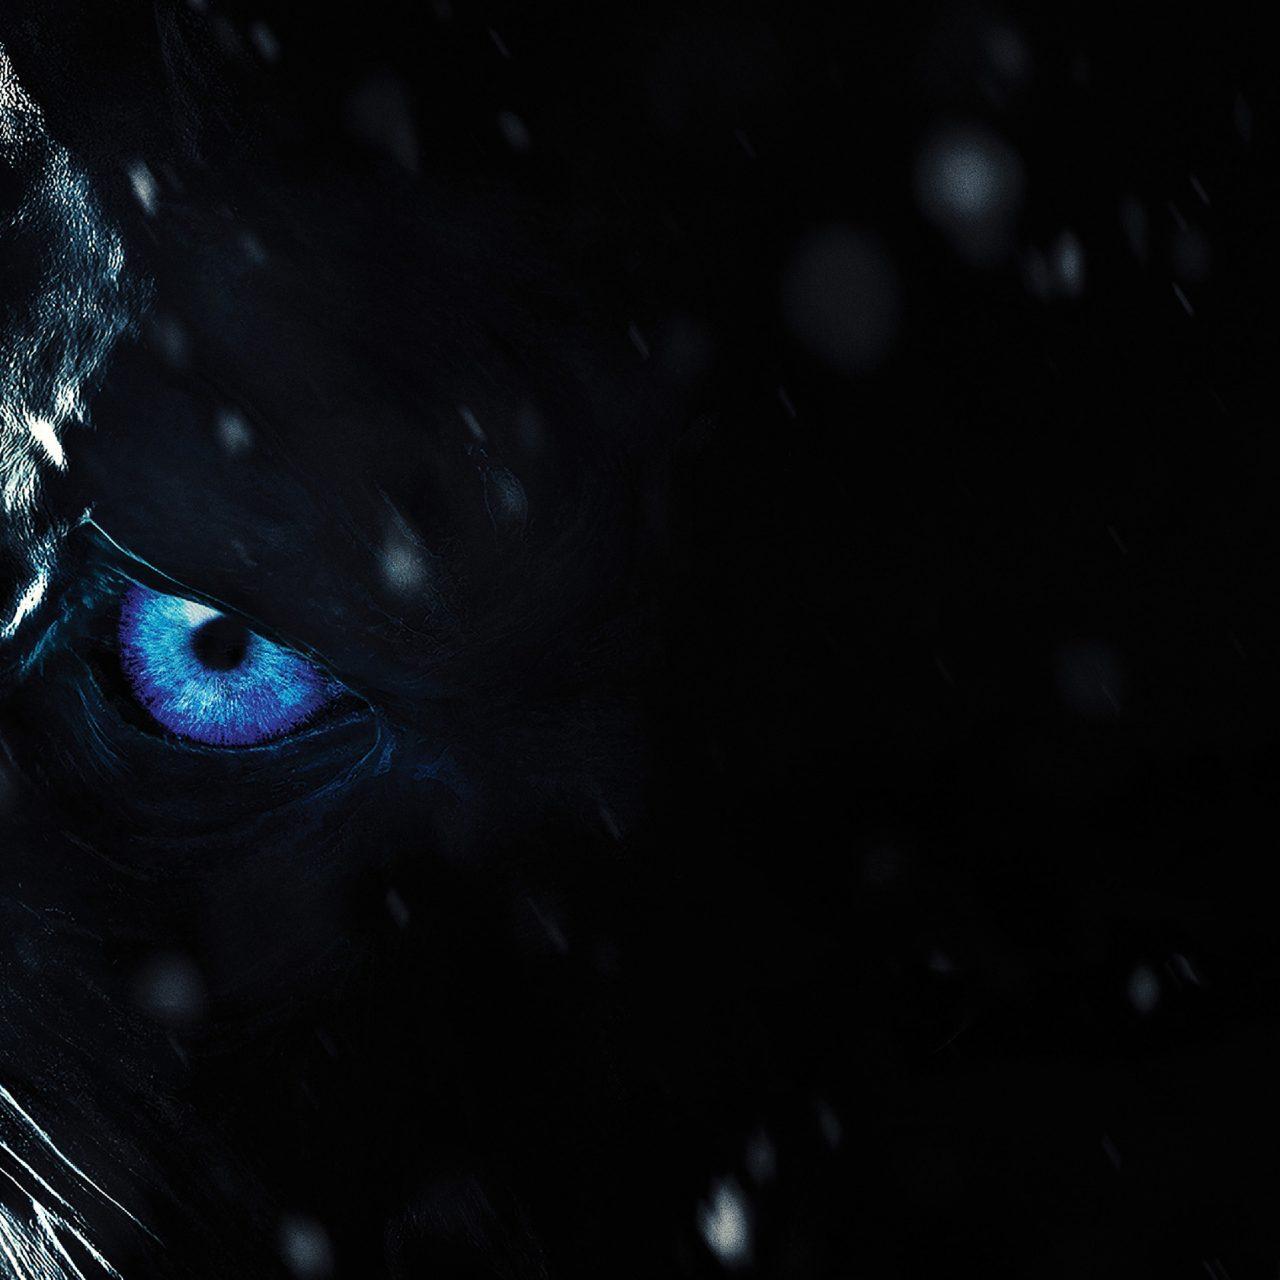 Game Of Thrones Season 7 White Walkers TV Show 4K